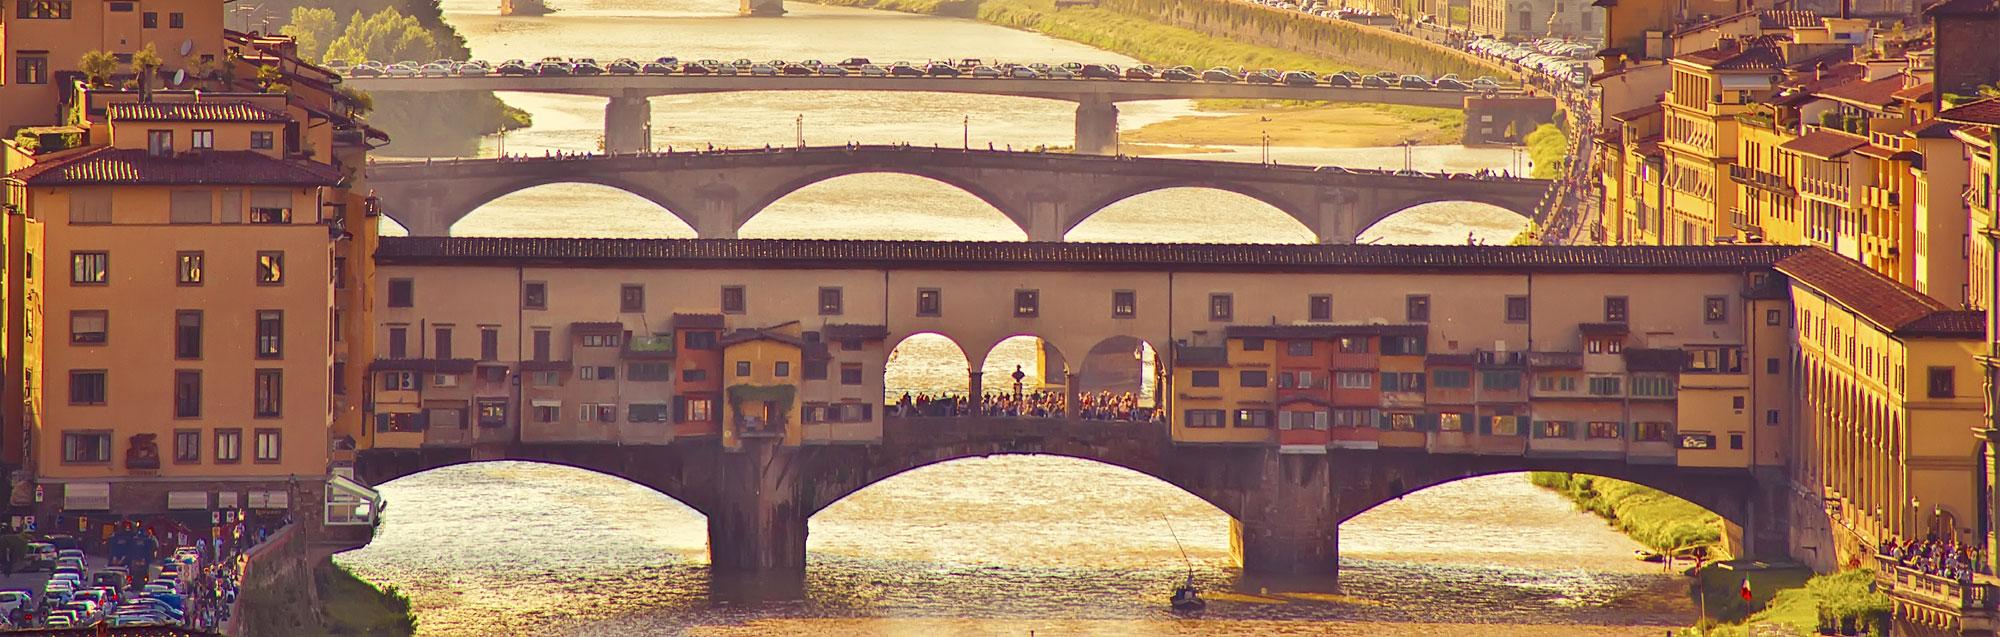 Sprachschulen Florenz, Sprachkurse Florenz